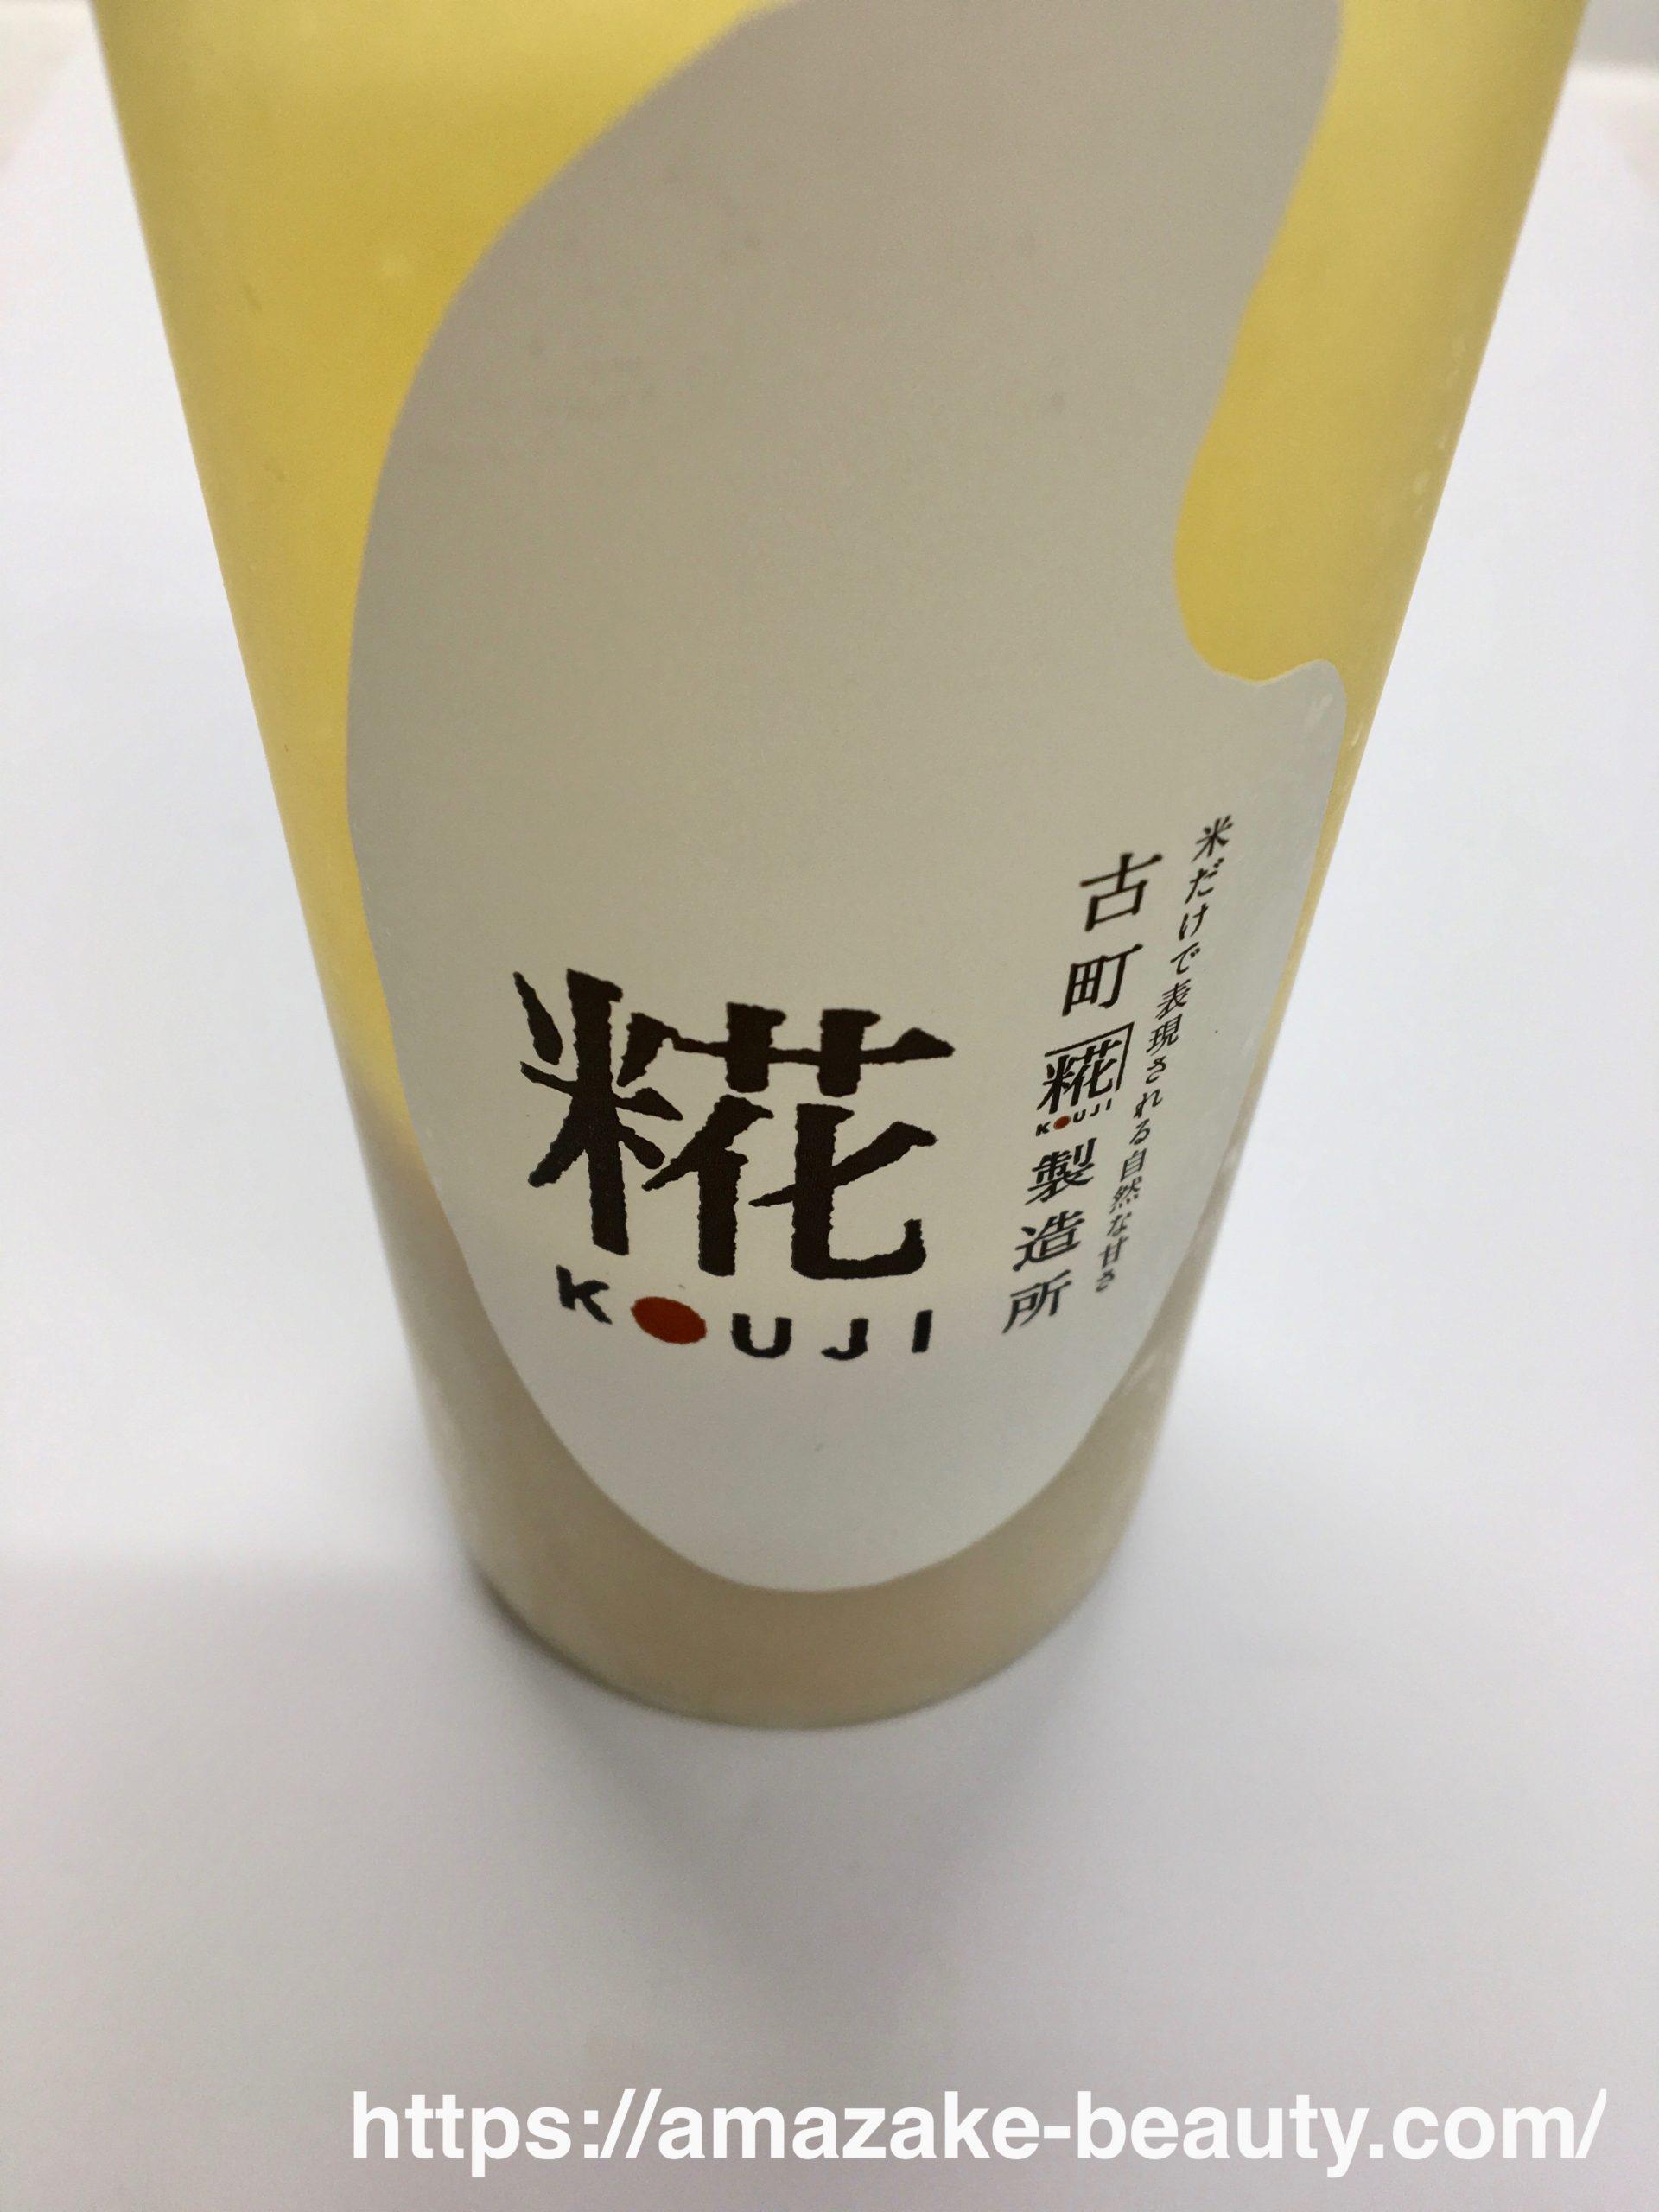 【甘酒】古町糀製造所『糀』(飲んだ感想)